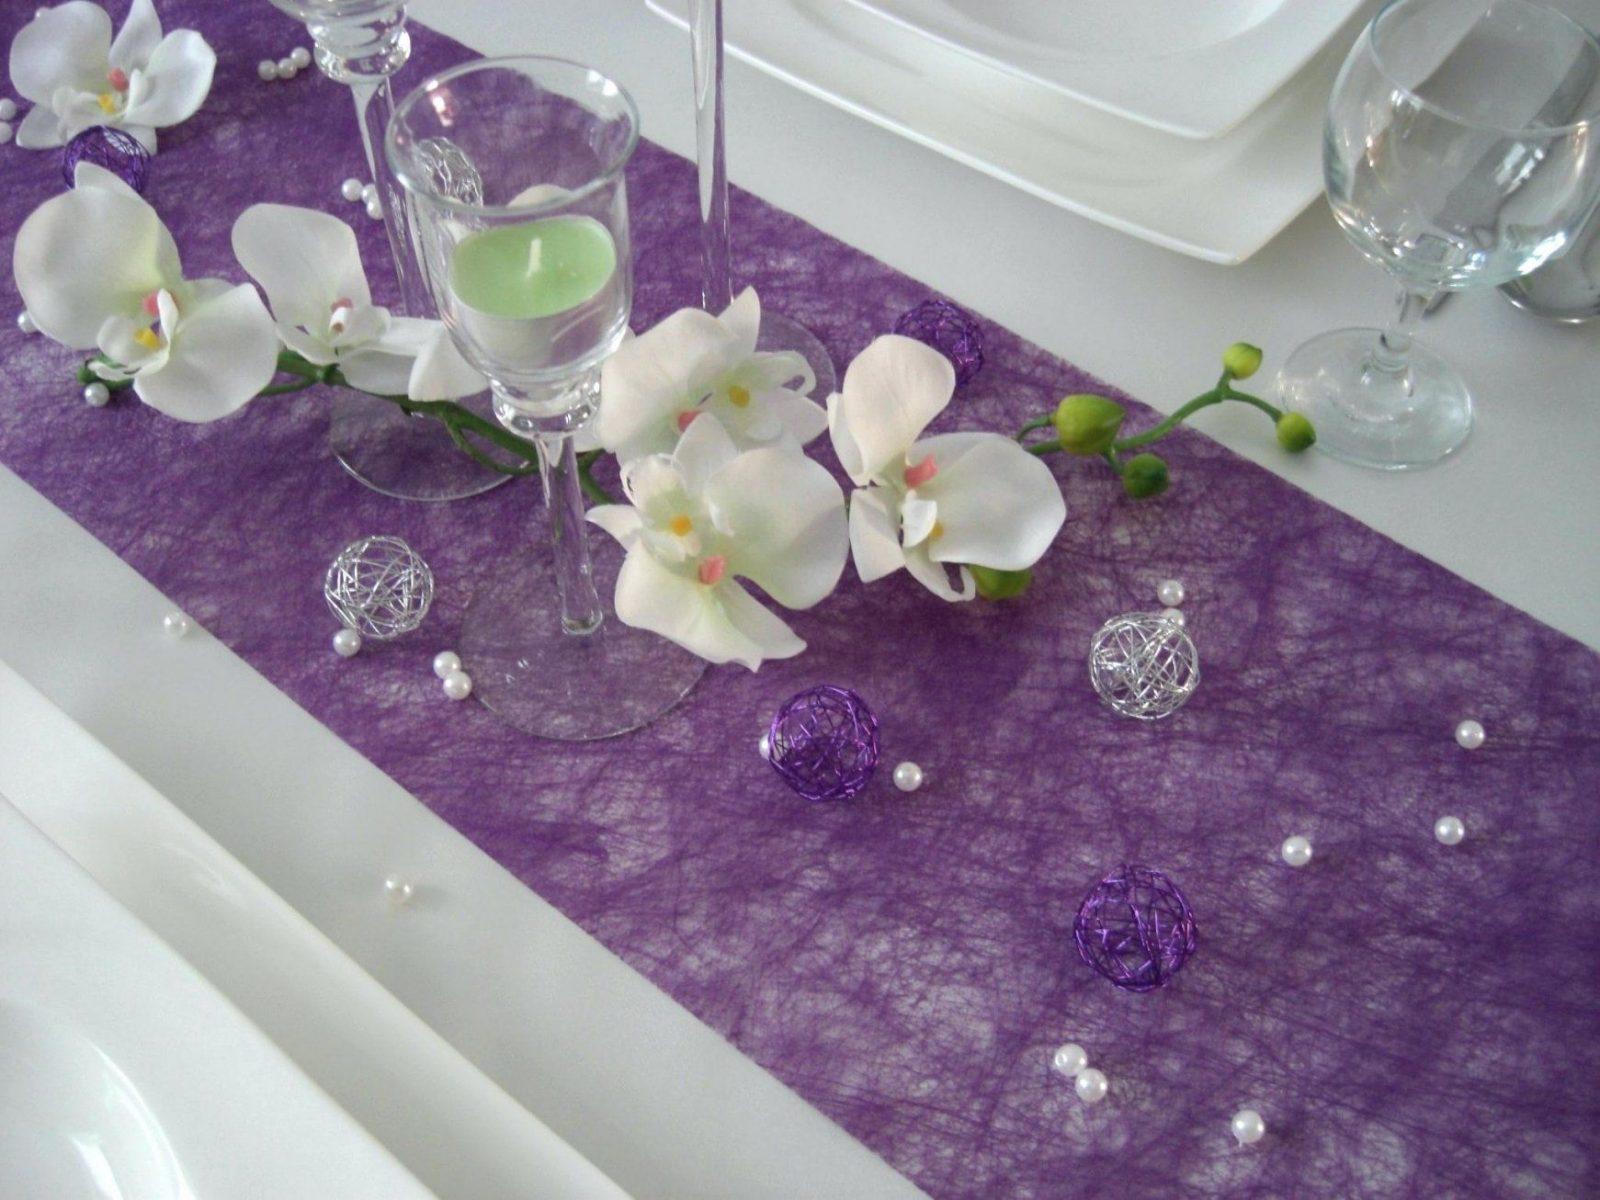 Tischdeko Lila Fenteer Rosenkopfe 50 Stuck Deko Rosen Lila Violett